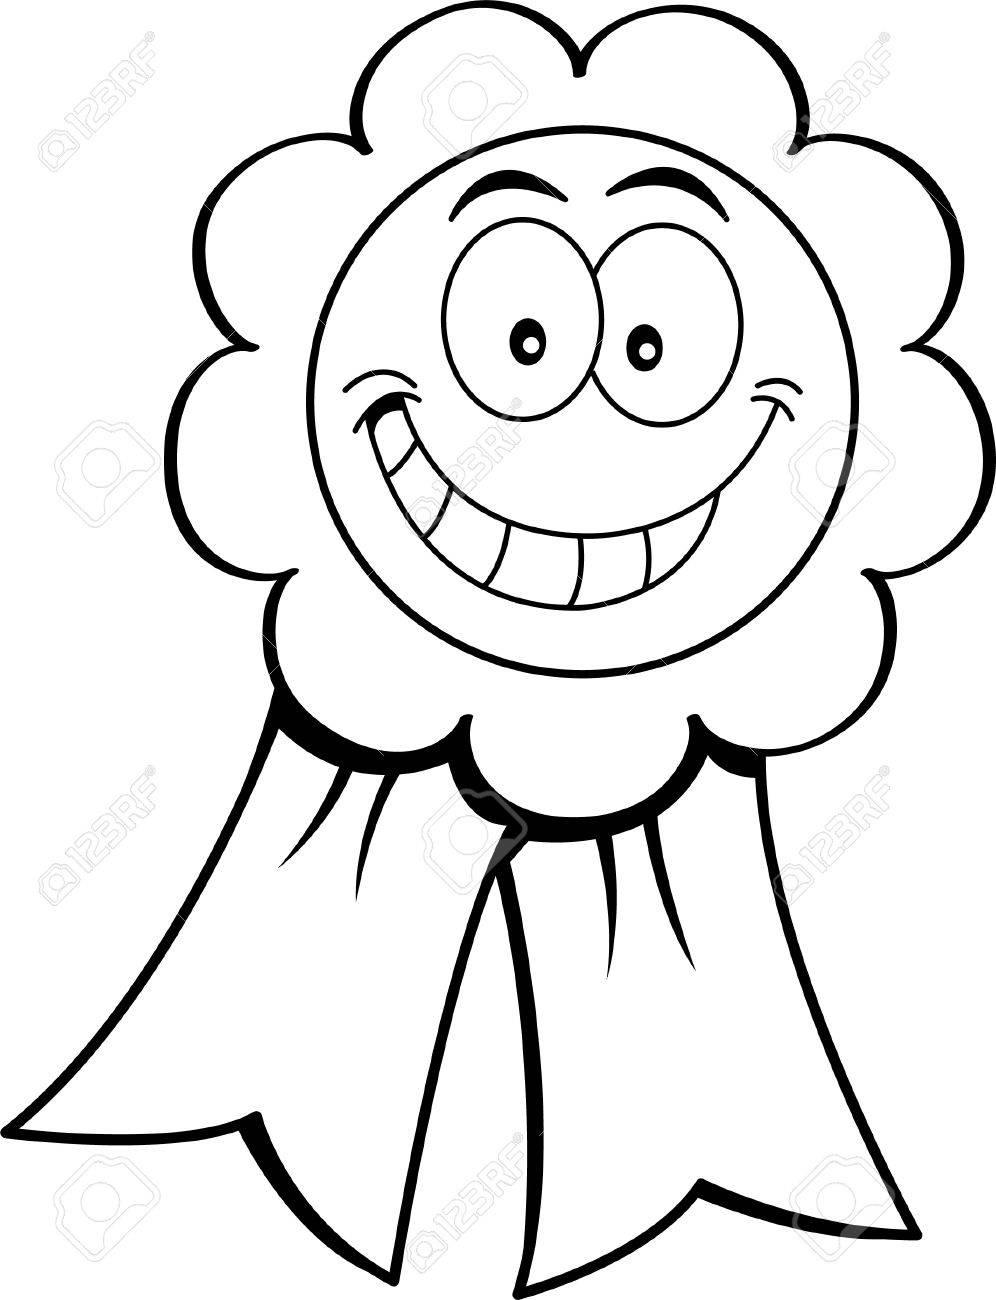 Black and white illustration of an award ribbon.